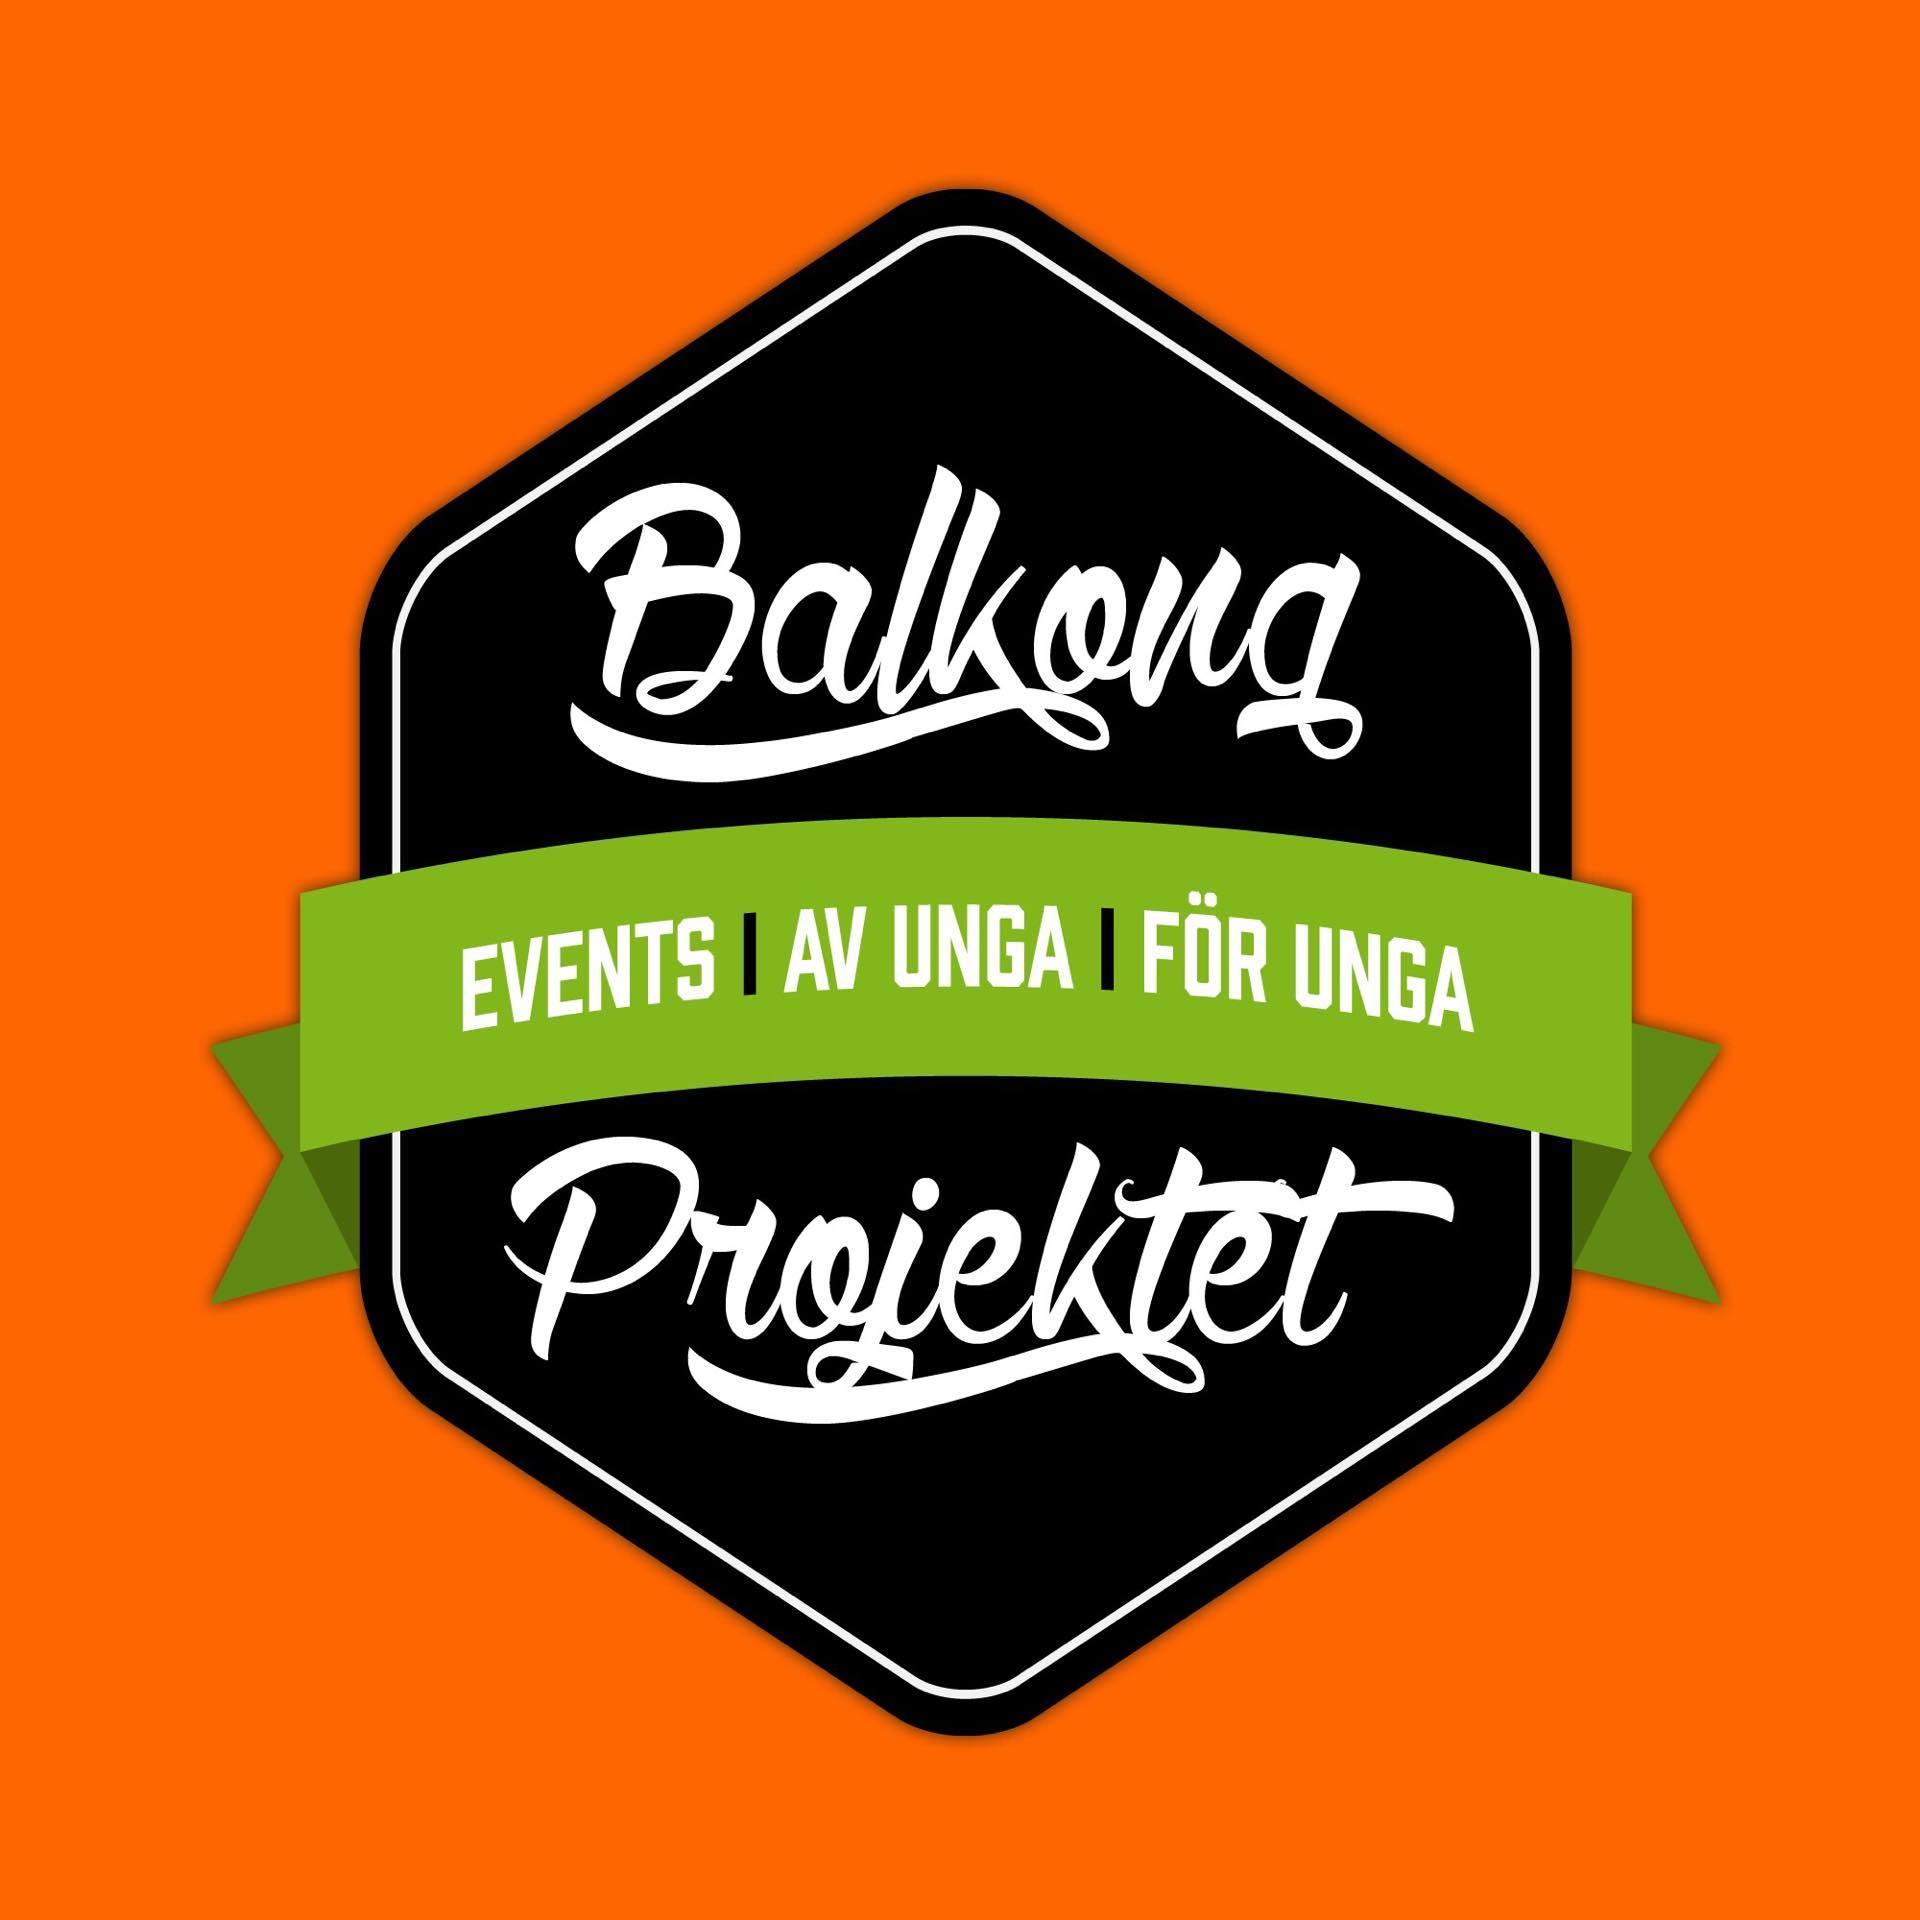 Balkongprojekt logga